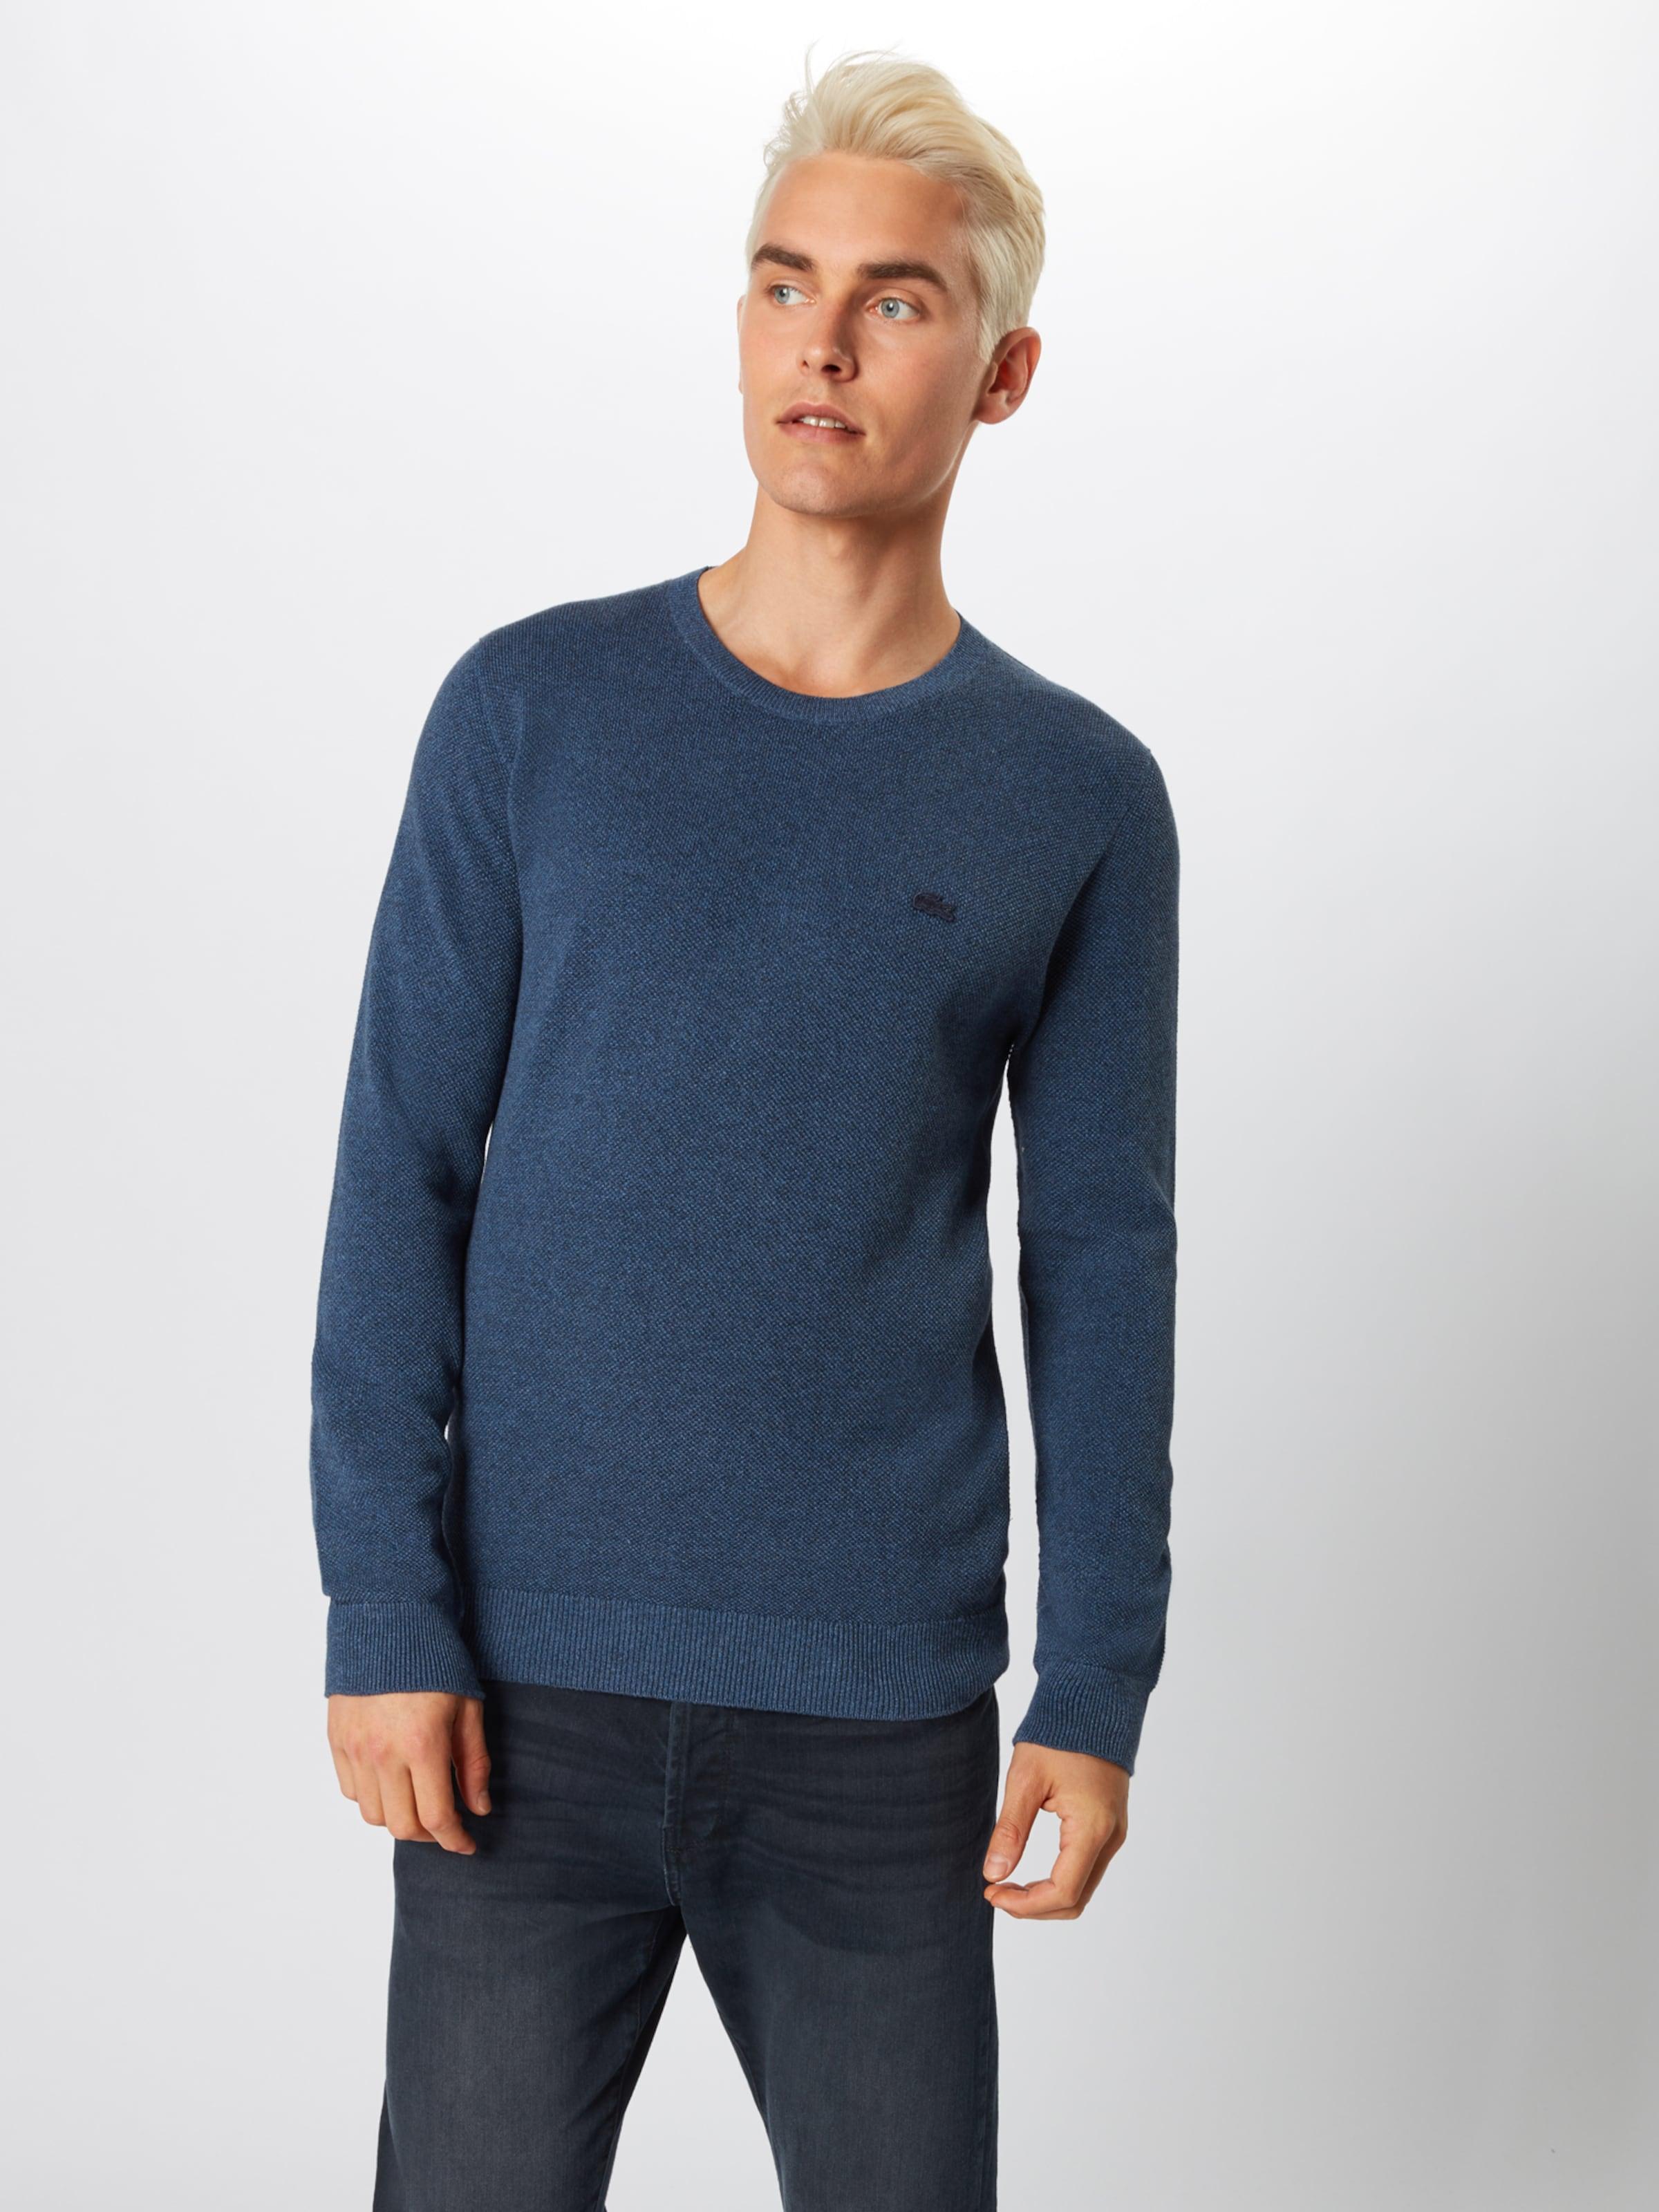 En Indigo over Lacoste 'tricot' Pull lKTF3Jc1